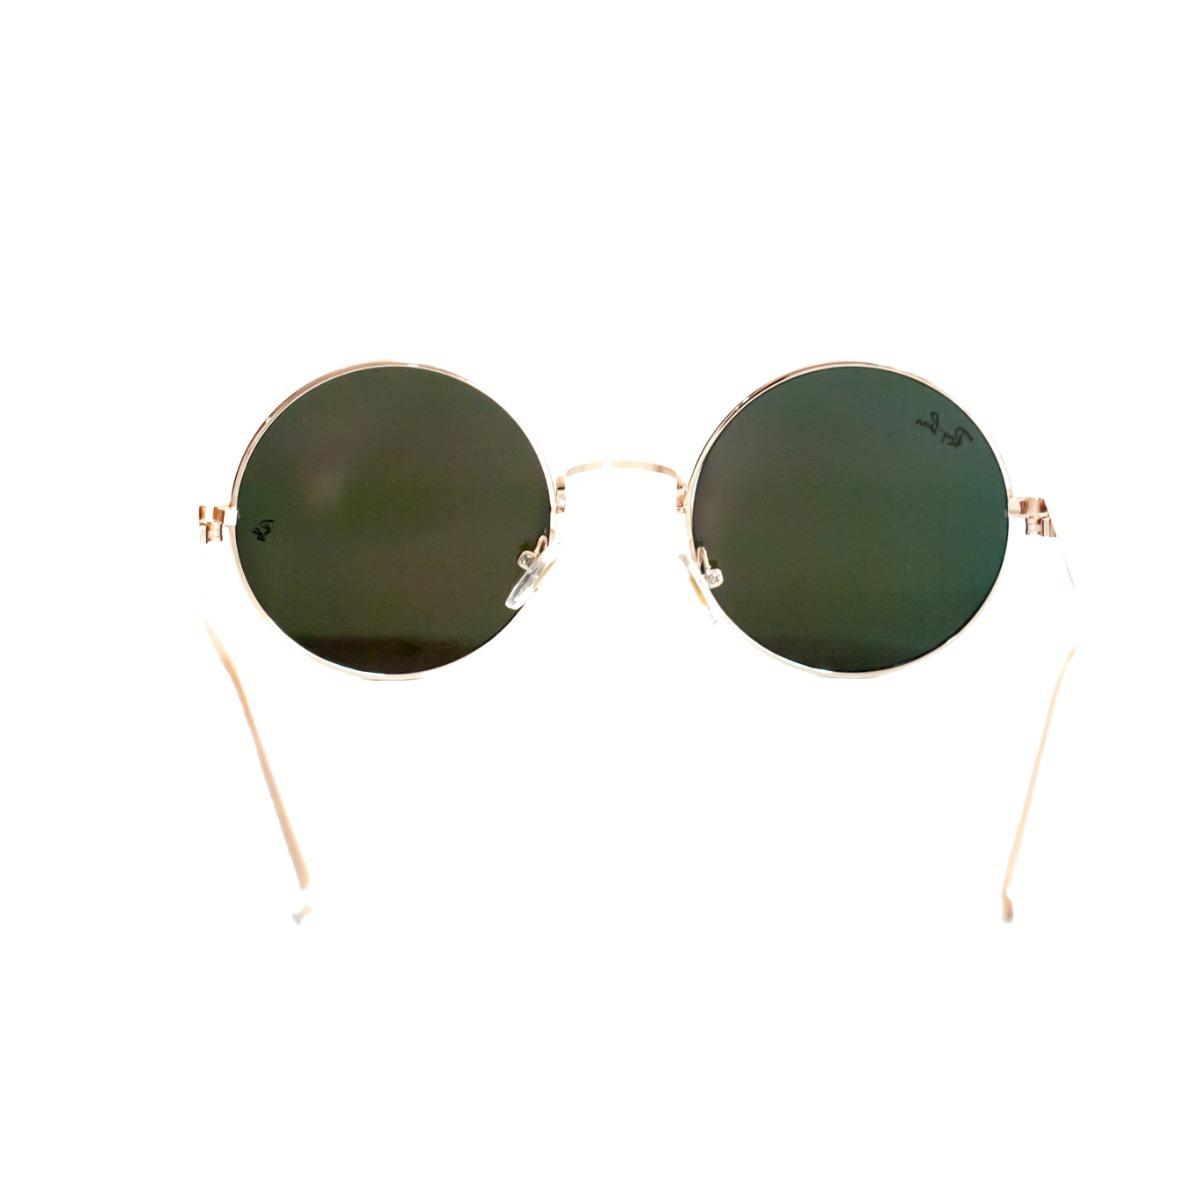 f406628450 Gafas De Sol Rayban Ja-jo Gold Rb3592 | Varios Colores Uv400 ...